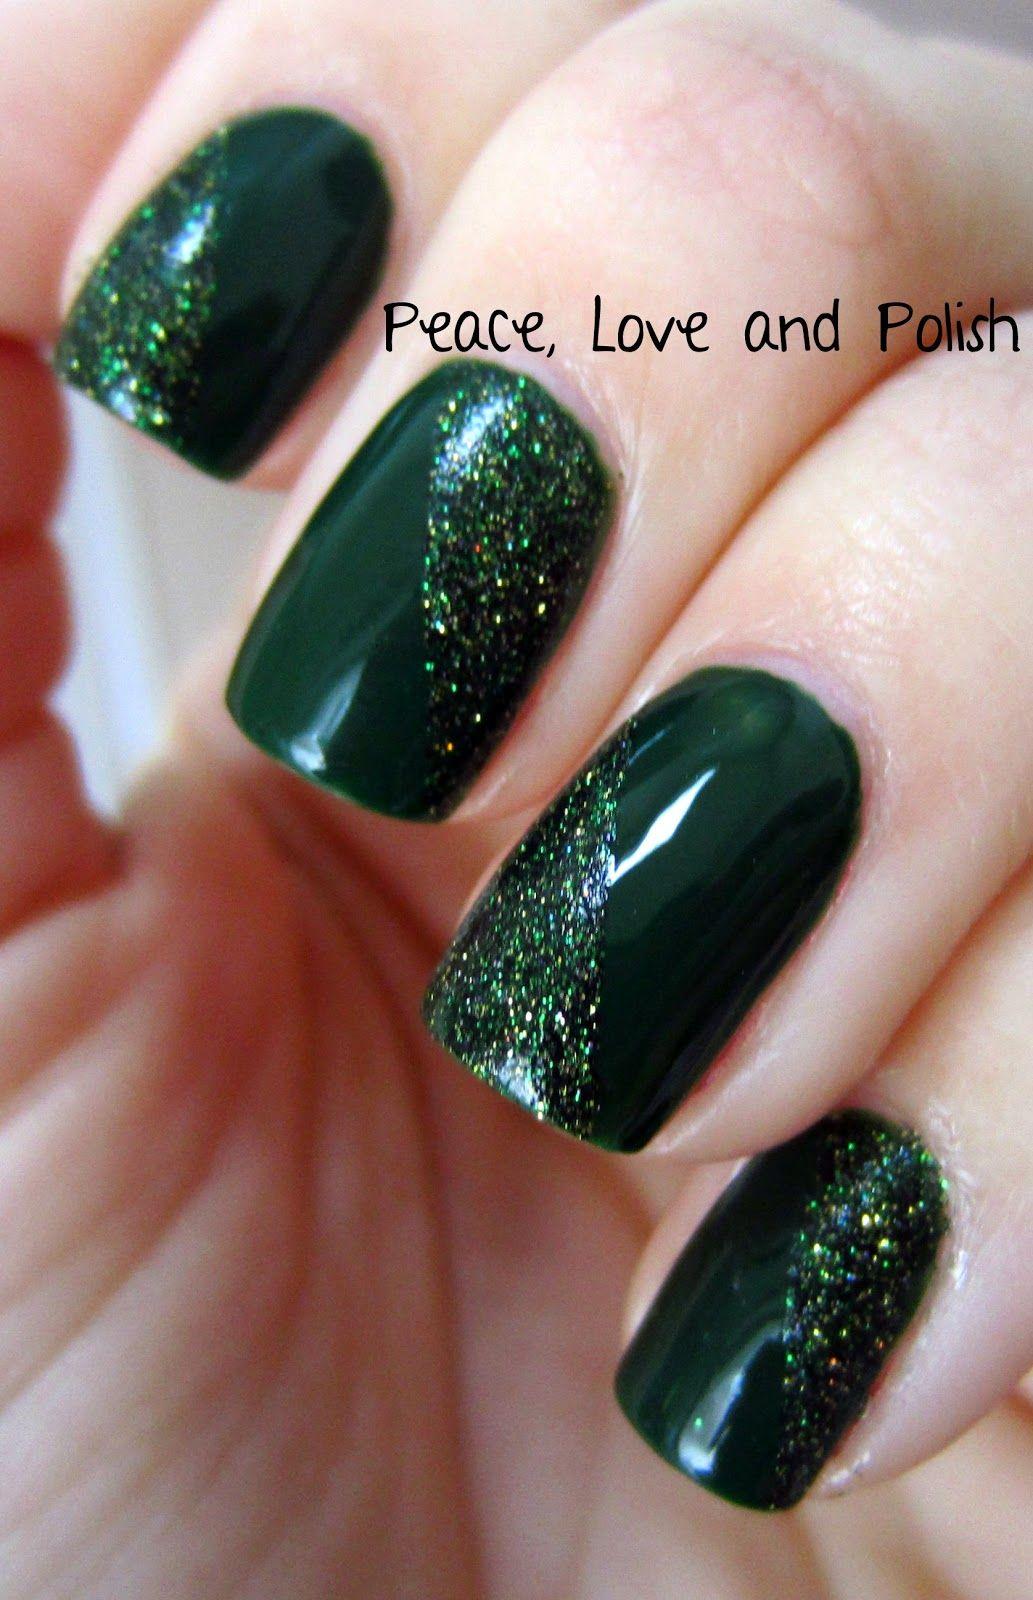 15 Emerald Green Nail Designs You Can Copy | Nails | Pinterest ...